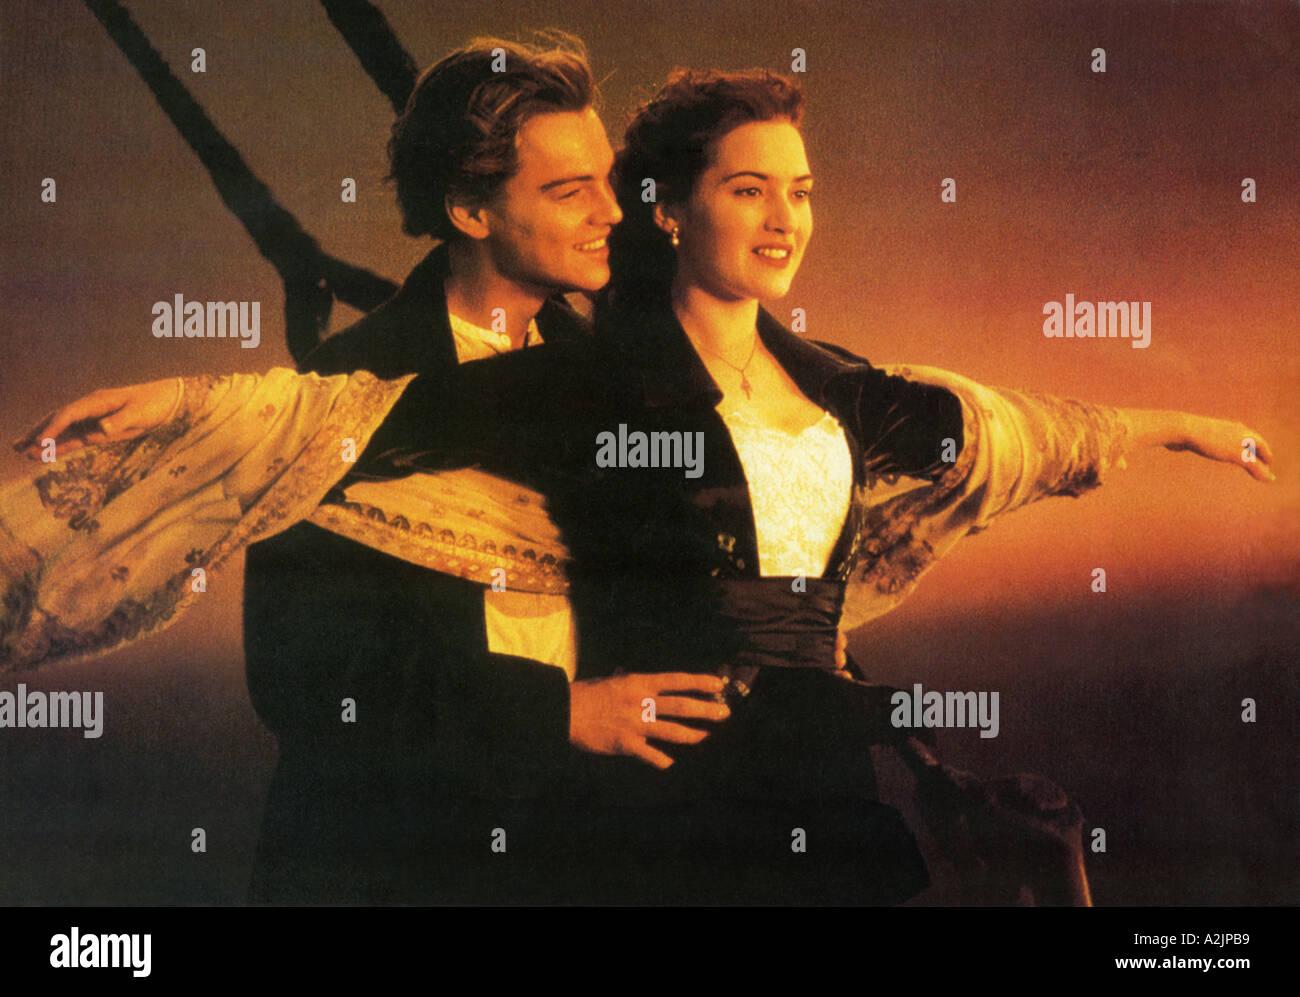 TITANIC-Oscar-prämierten 1997 Film mit Leonardo DiCaprio und Kate Winslet Stockfoto